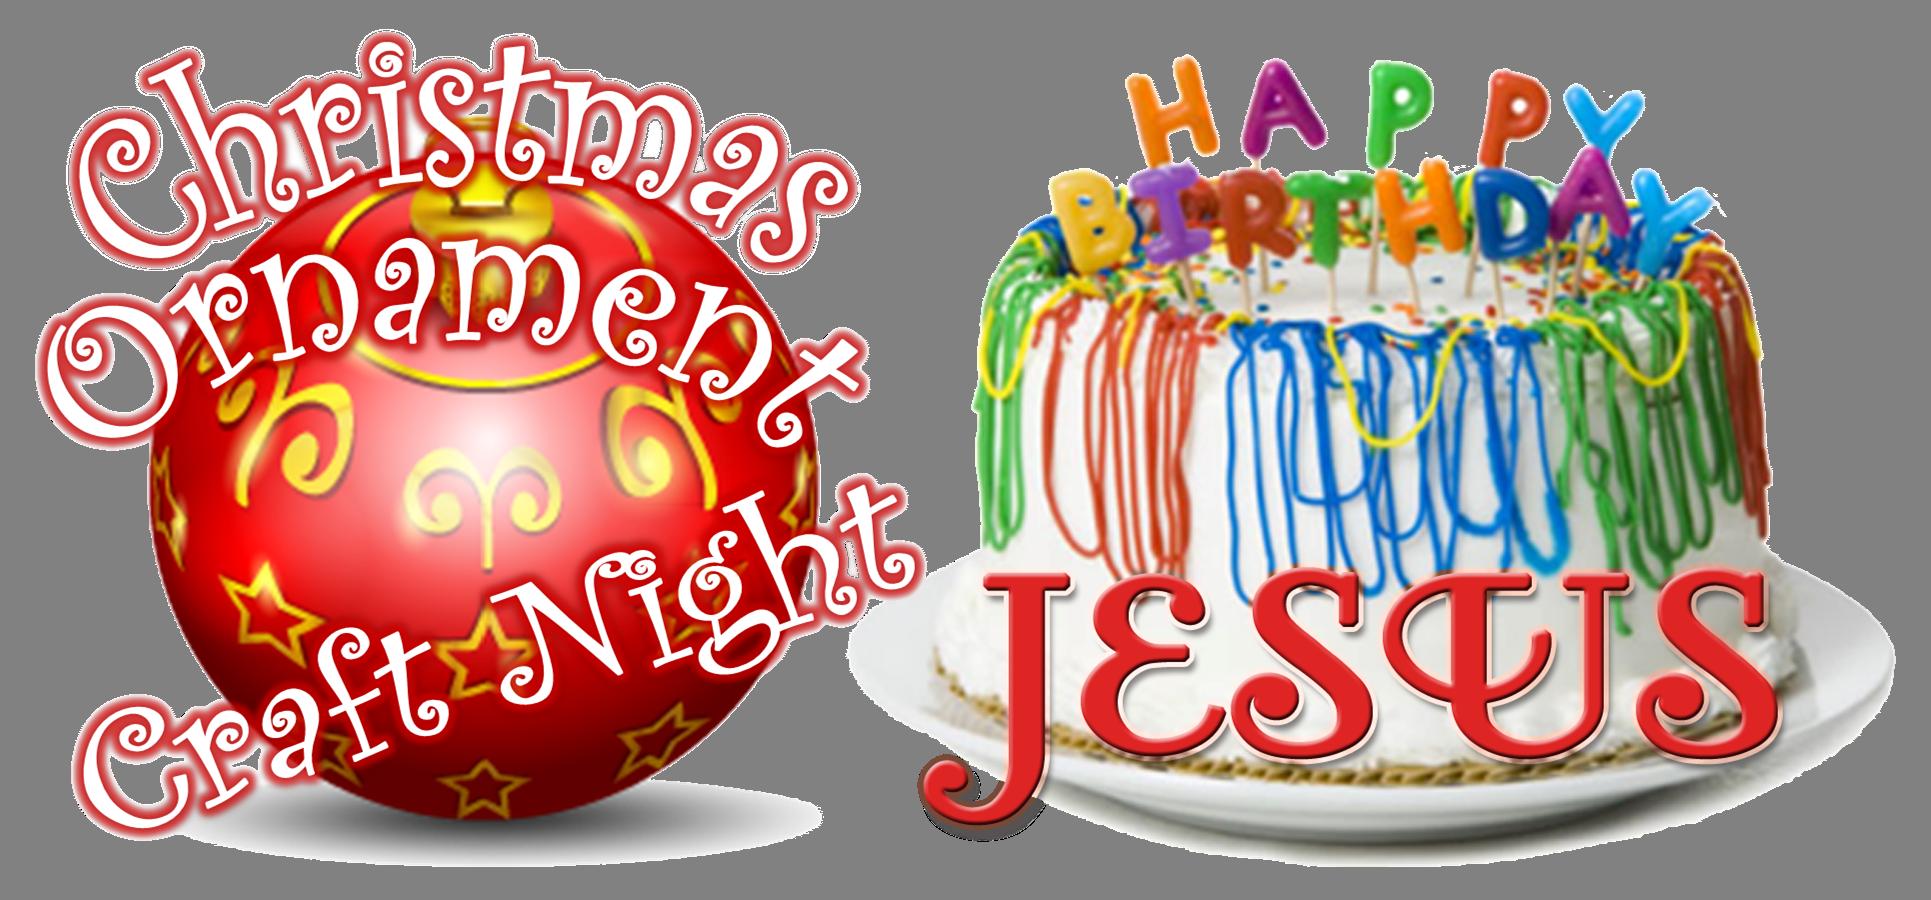 Christmas happy birthday clipart clip art transparent download Awana Christmas Ornament & Happy Birthday Jesus Night clip art transparent download